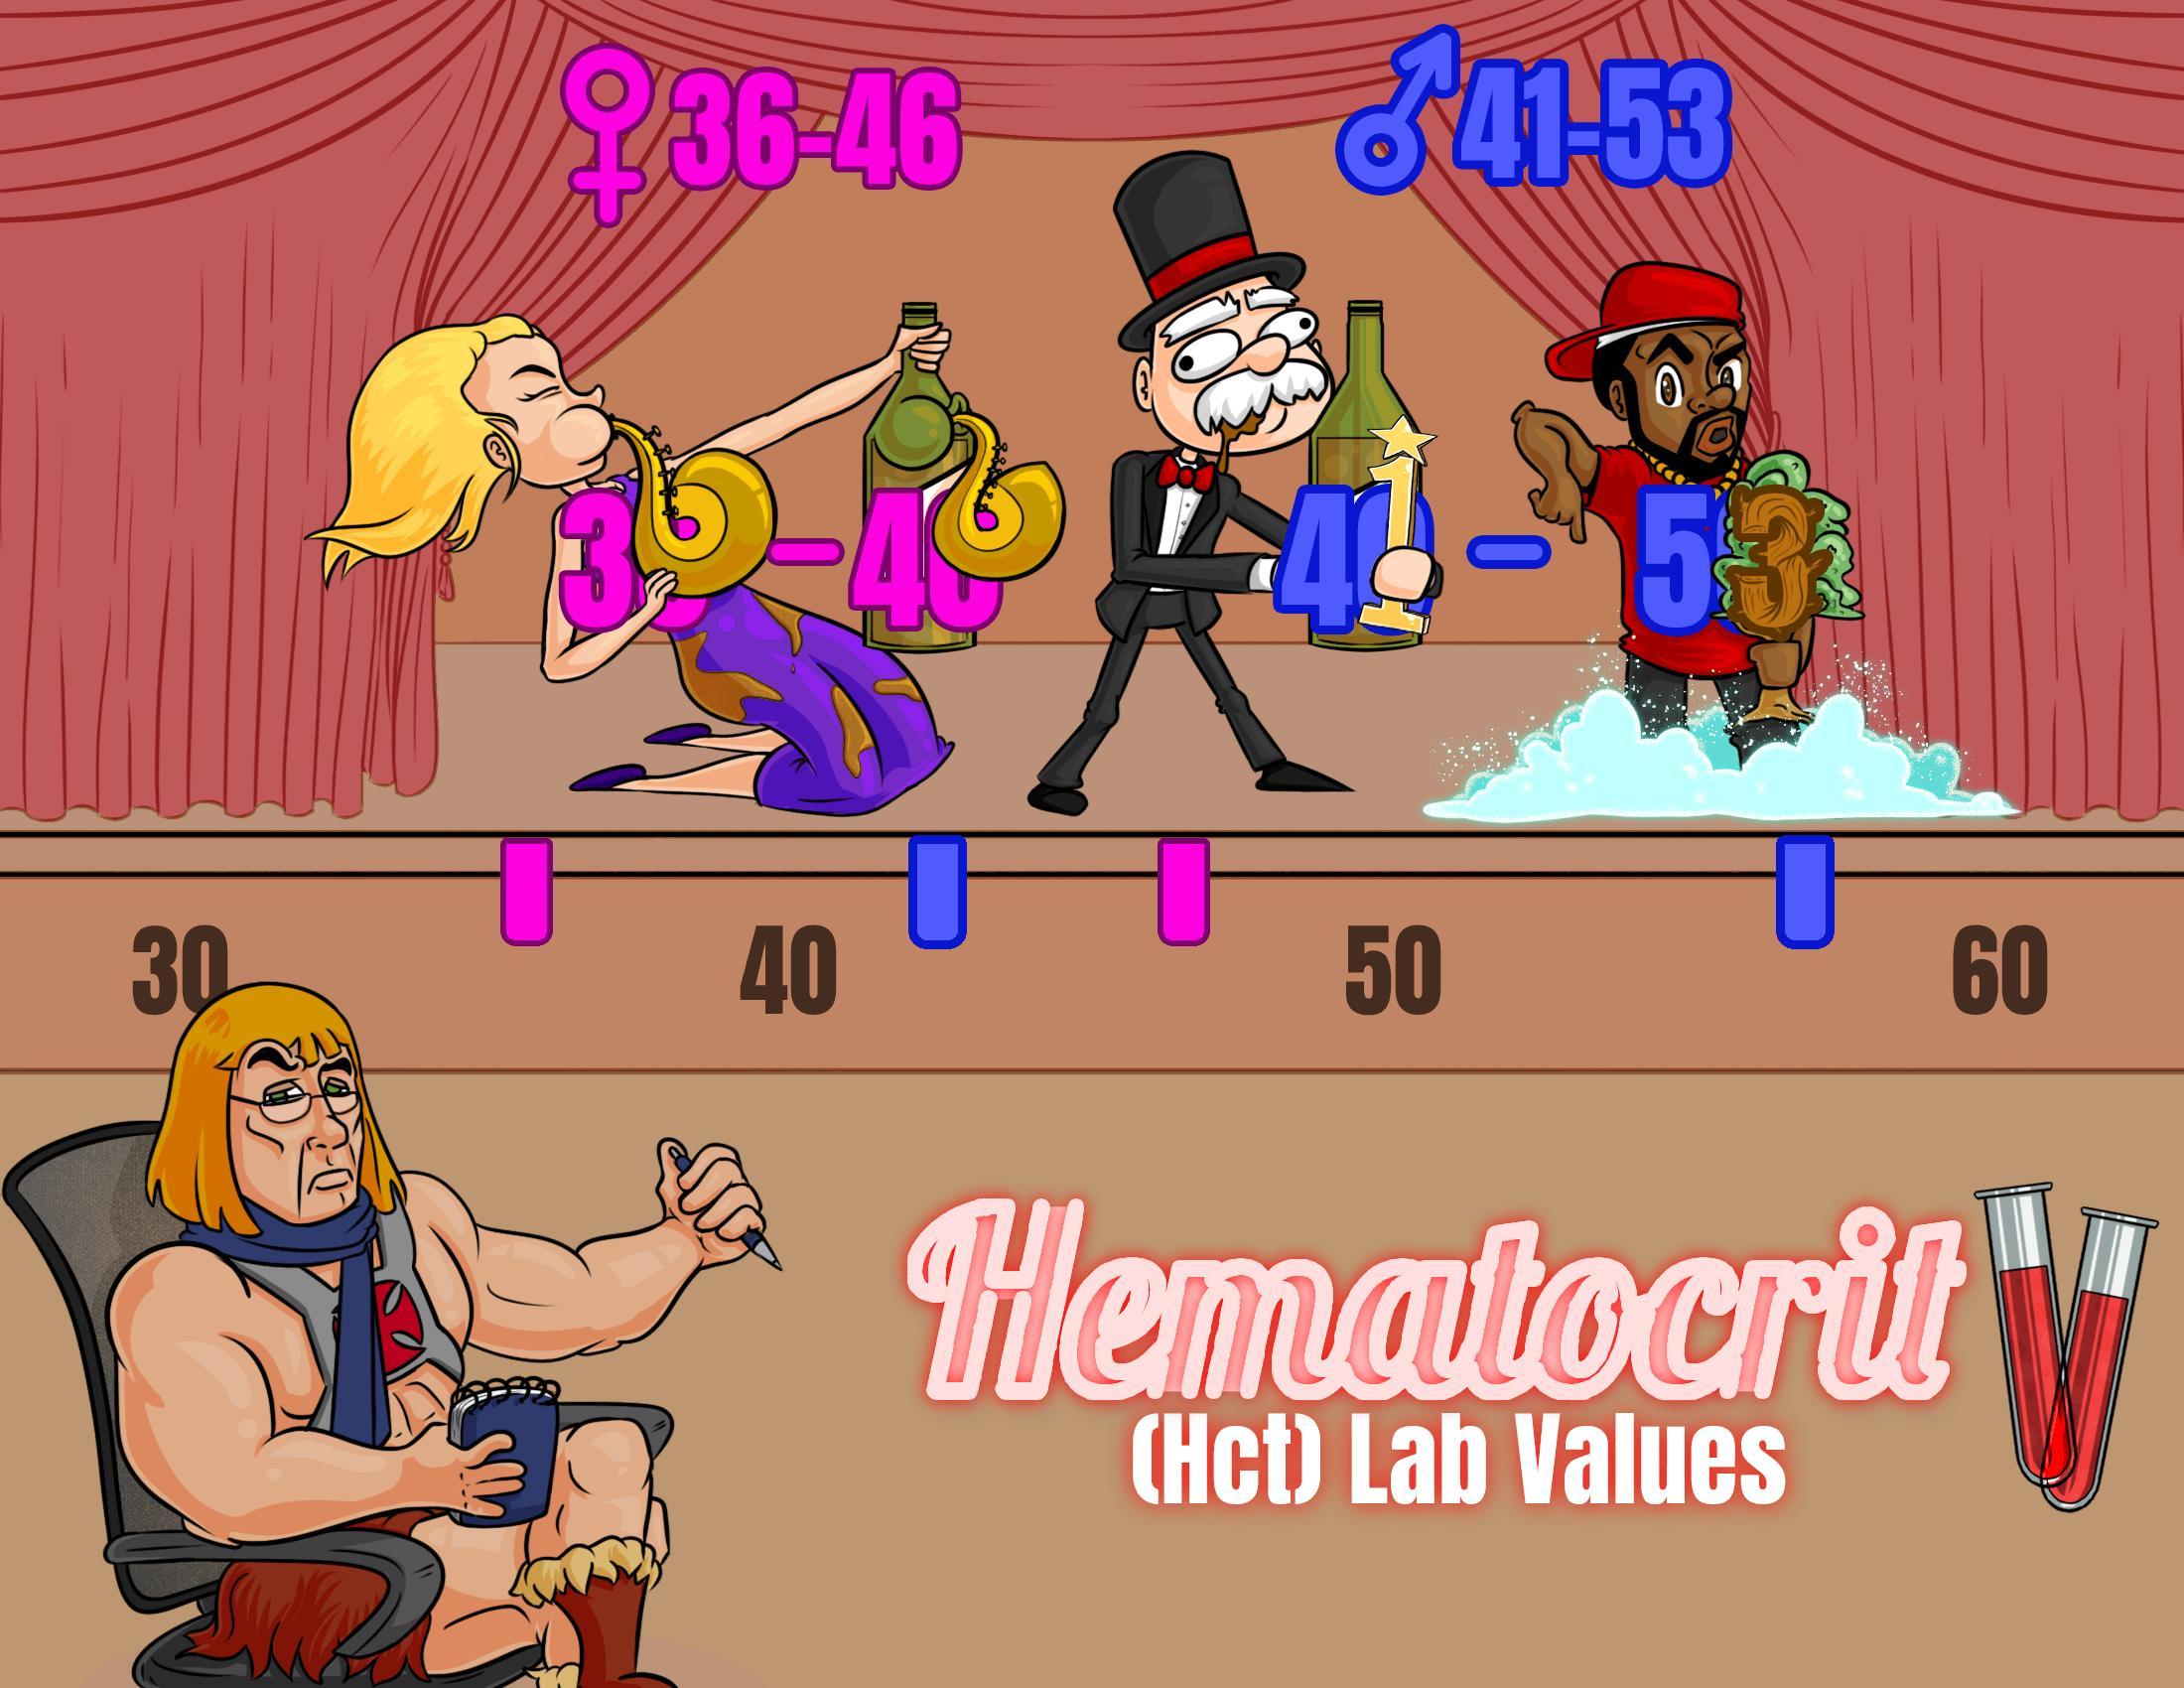 Hematocrit (Hct) Lab Values